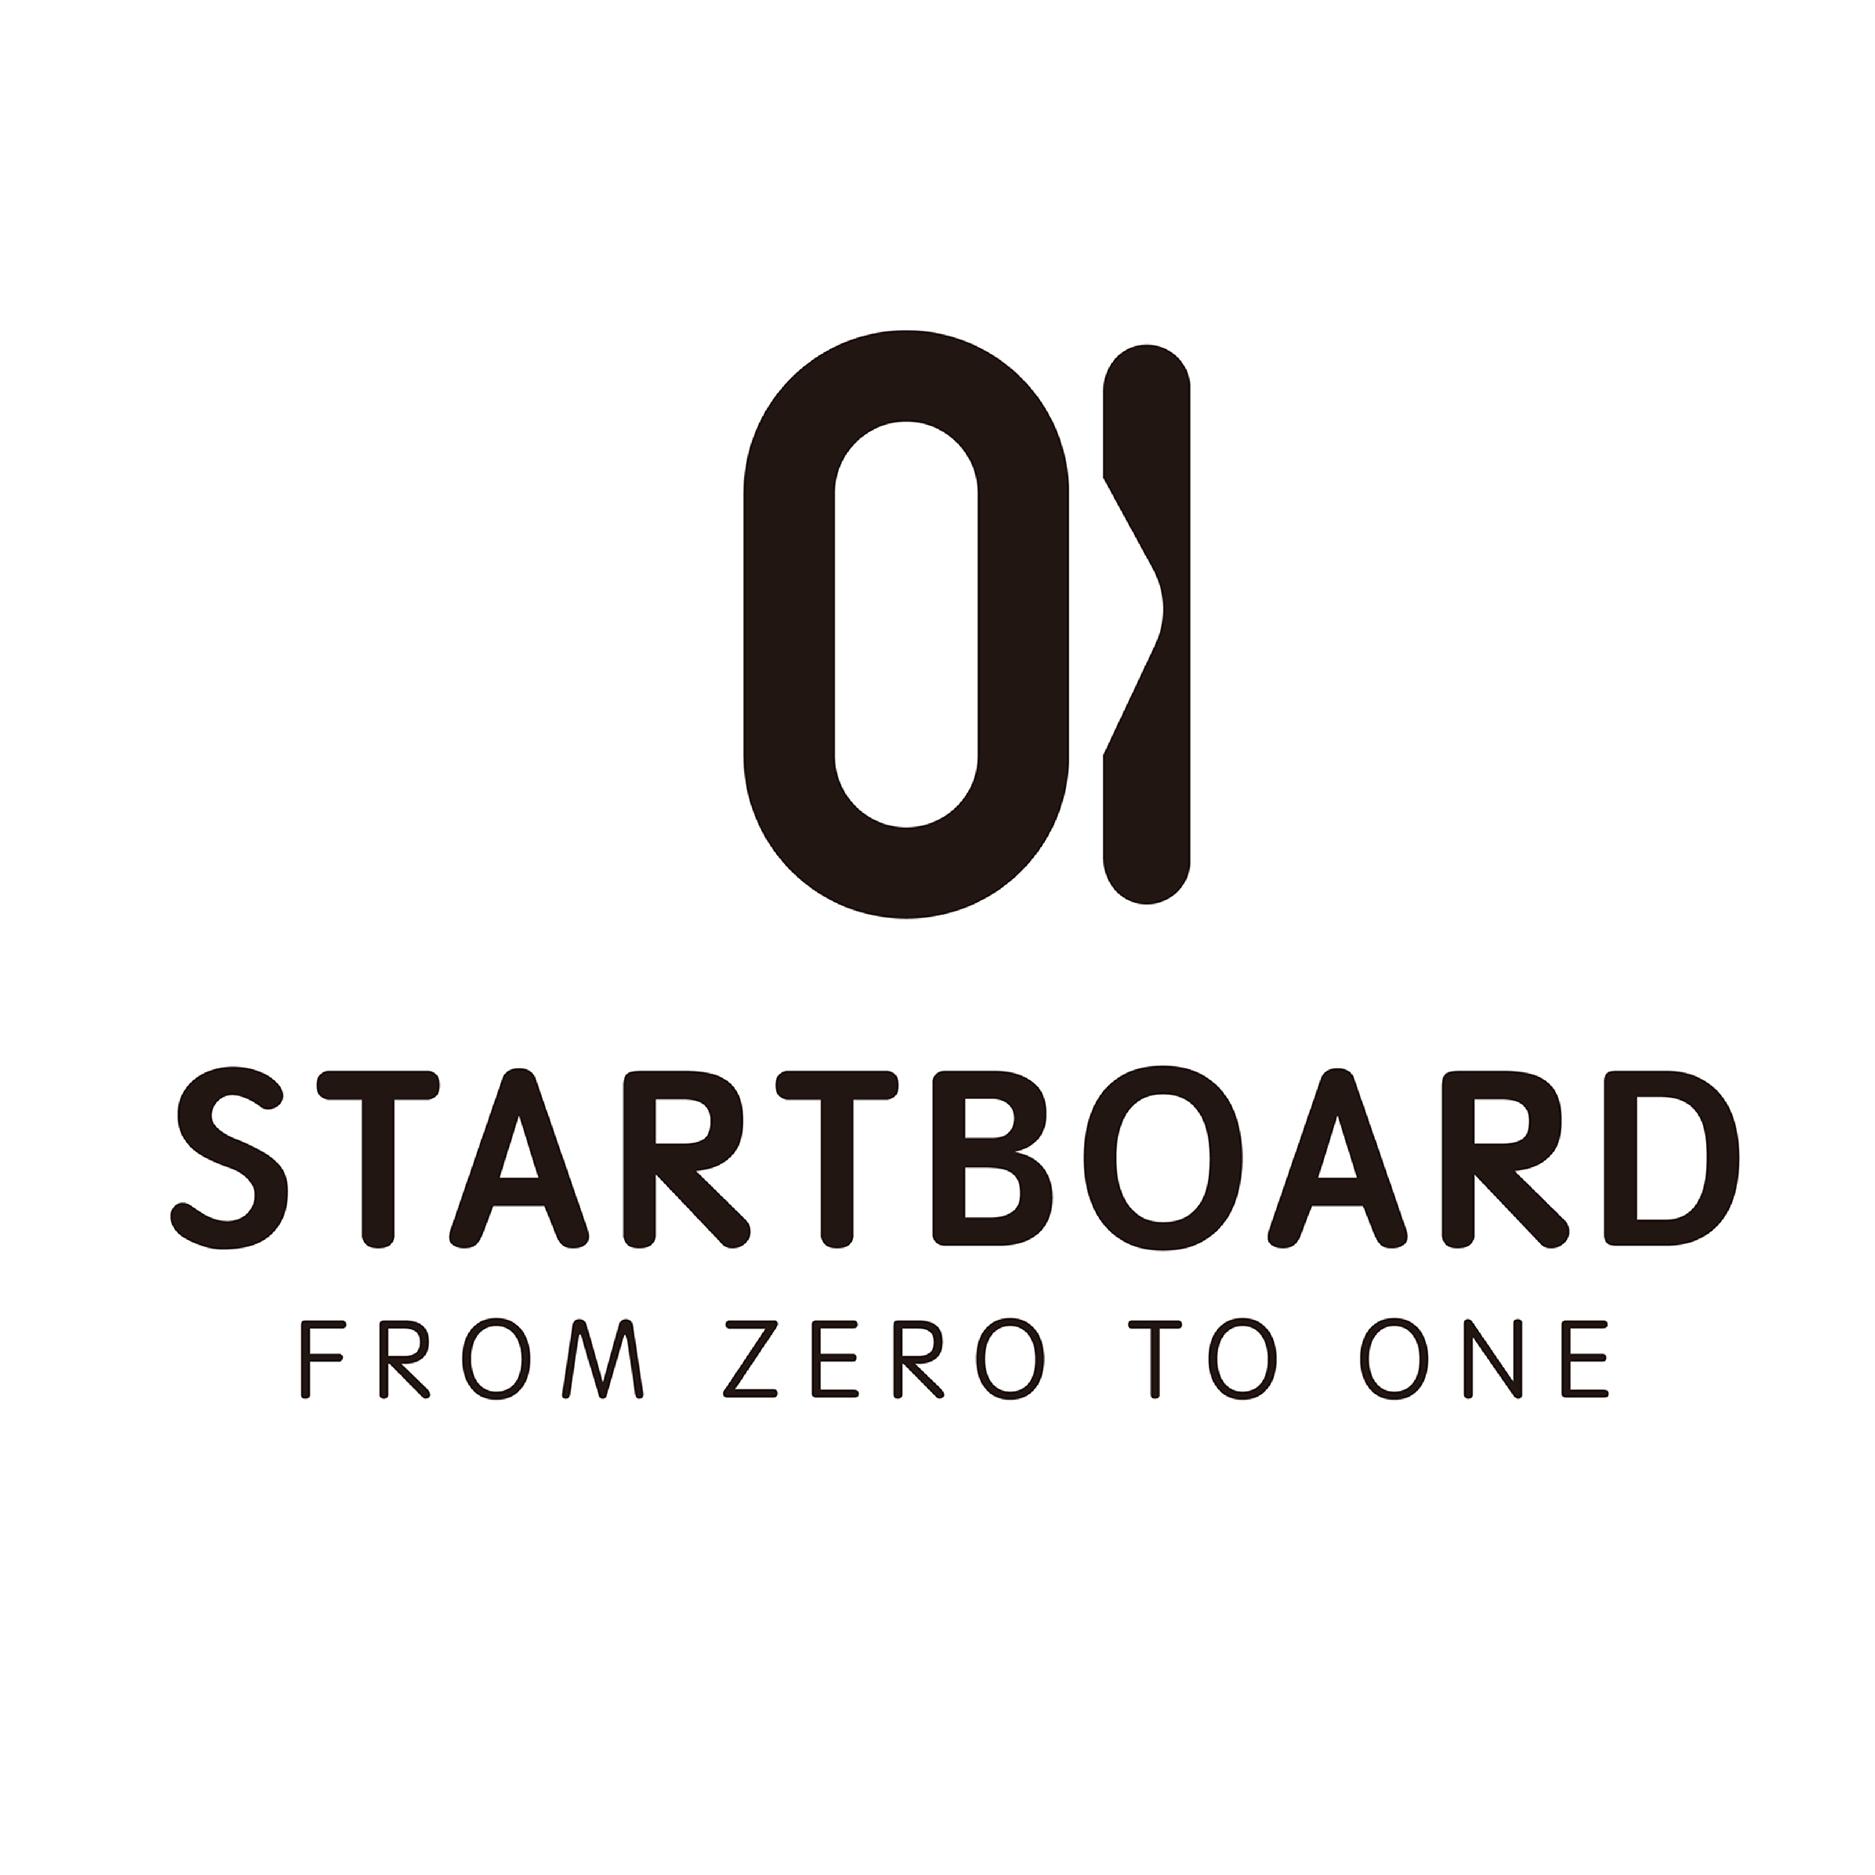 STARTBOARD